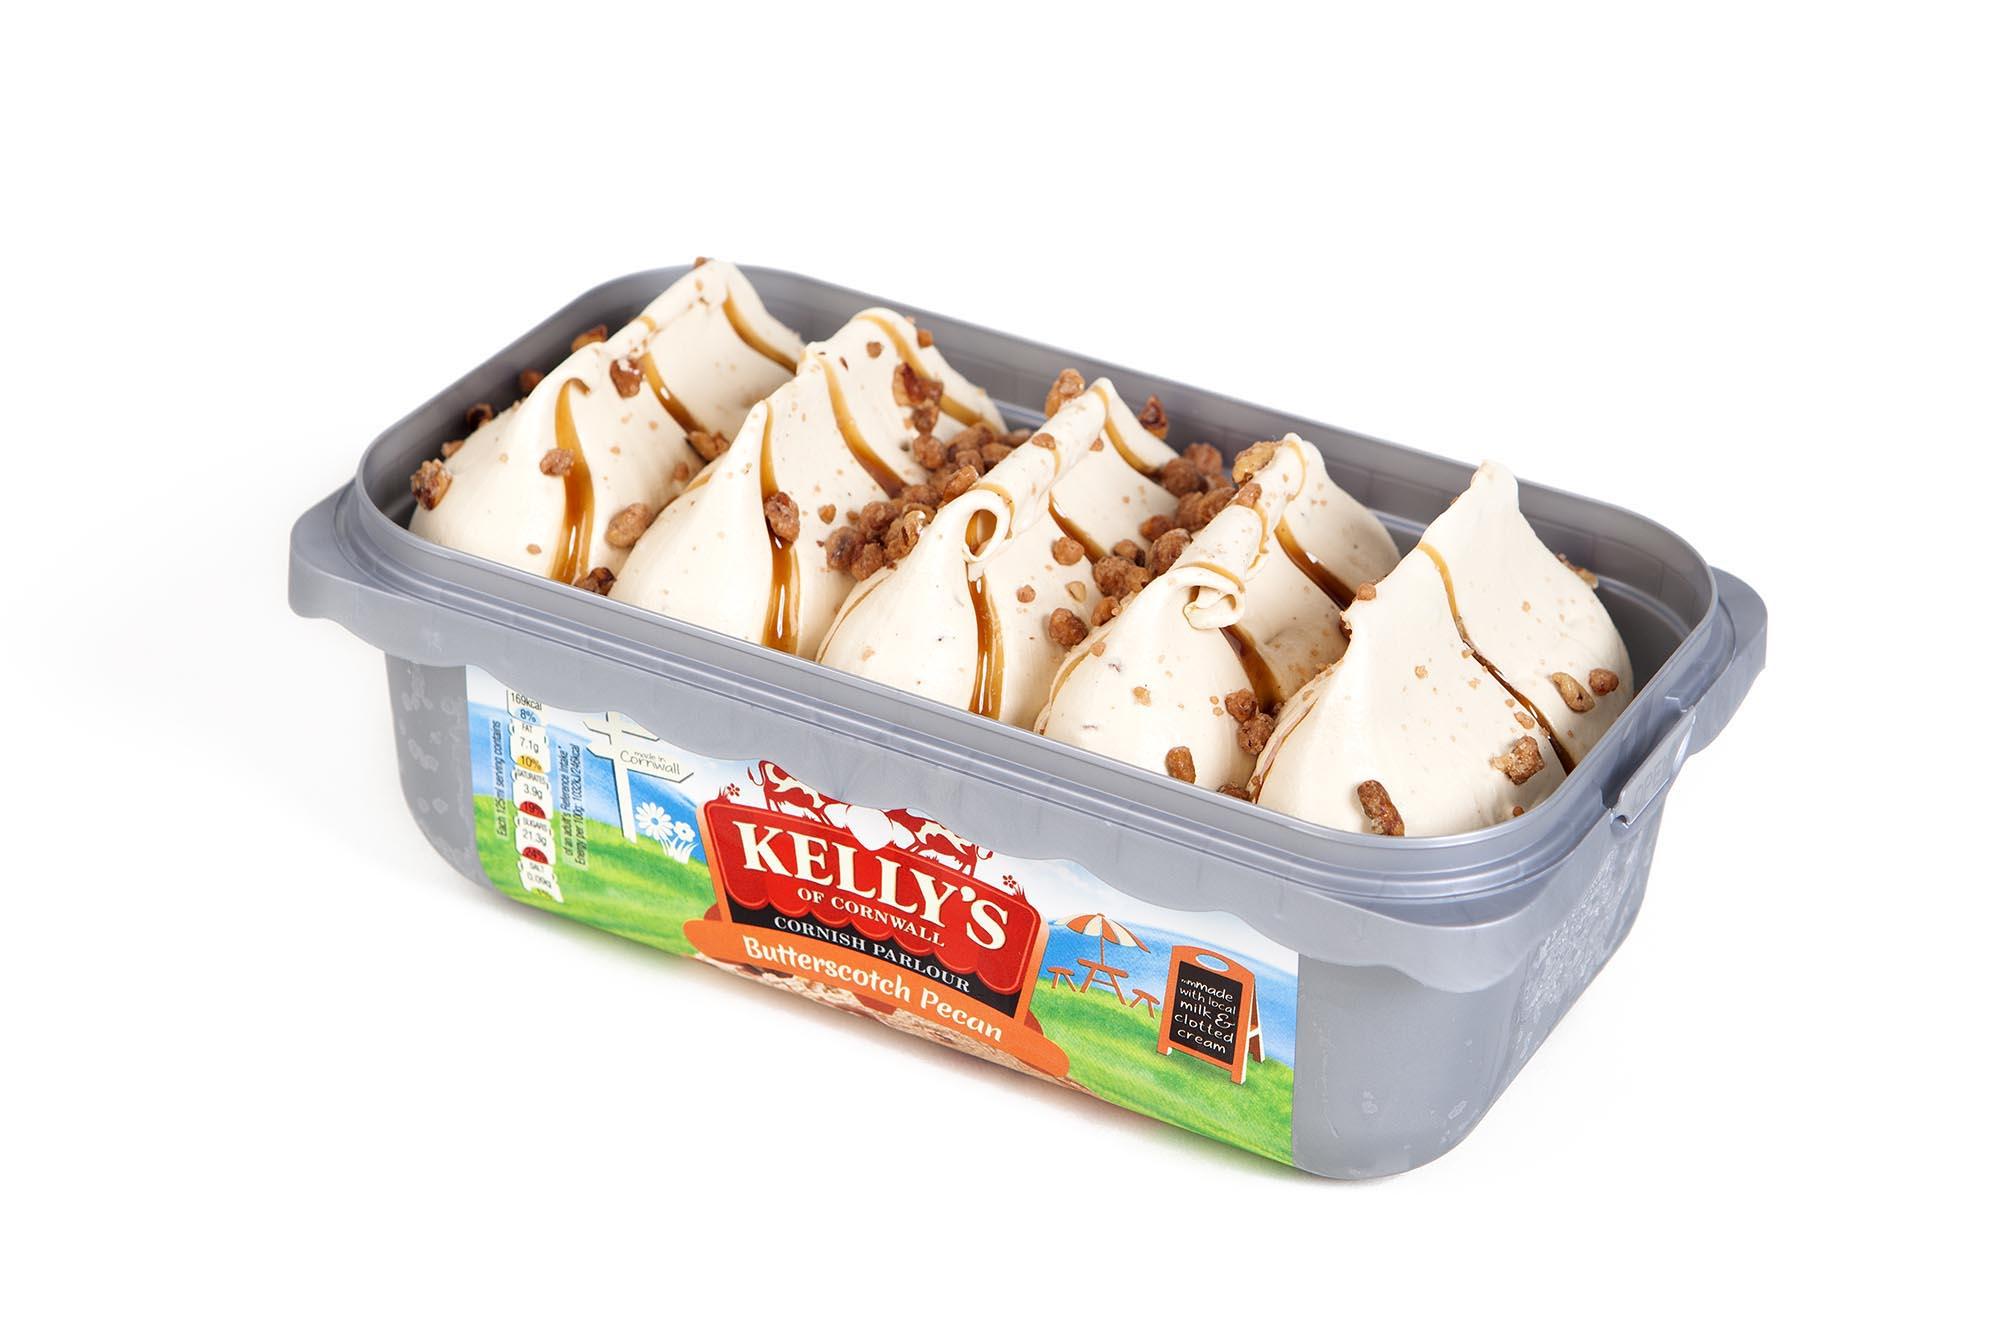 Kelly's Cornish Parlour Butterscotch Pecan Ice Cream (950ml) - £1.50 @ Heron Foods